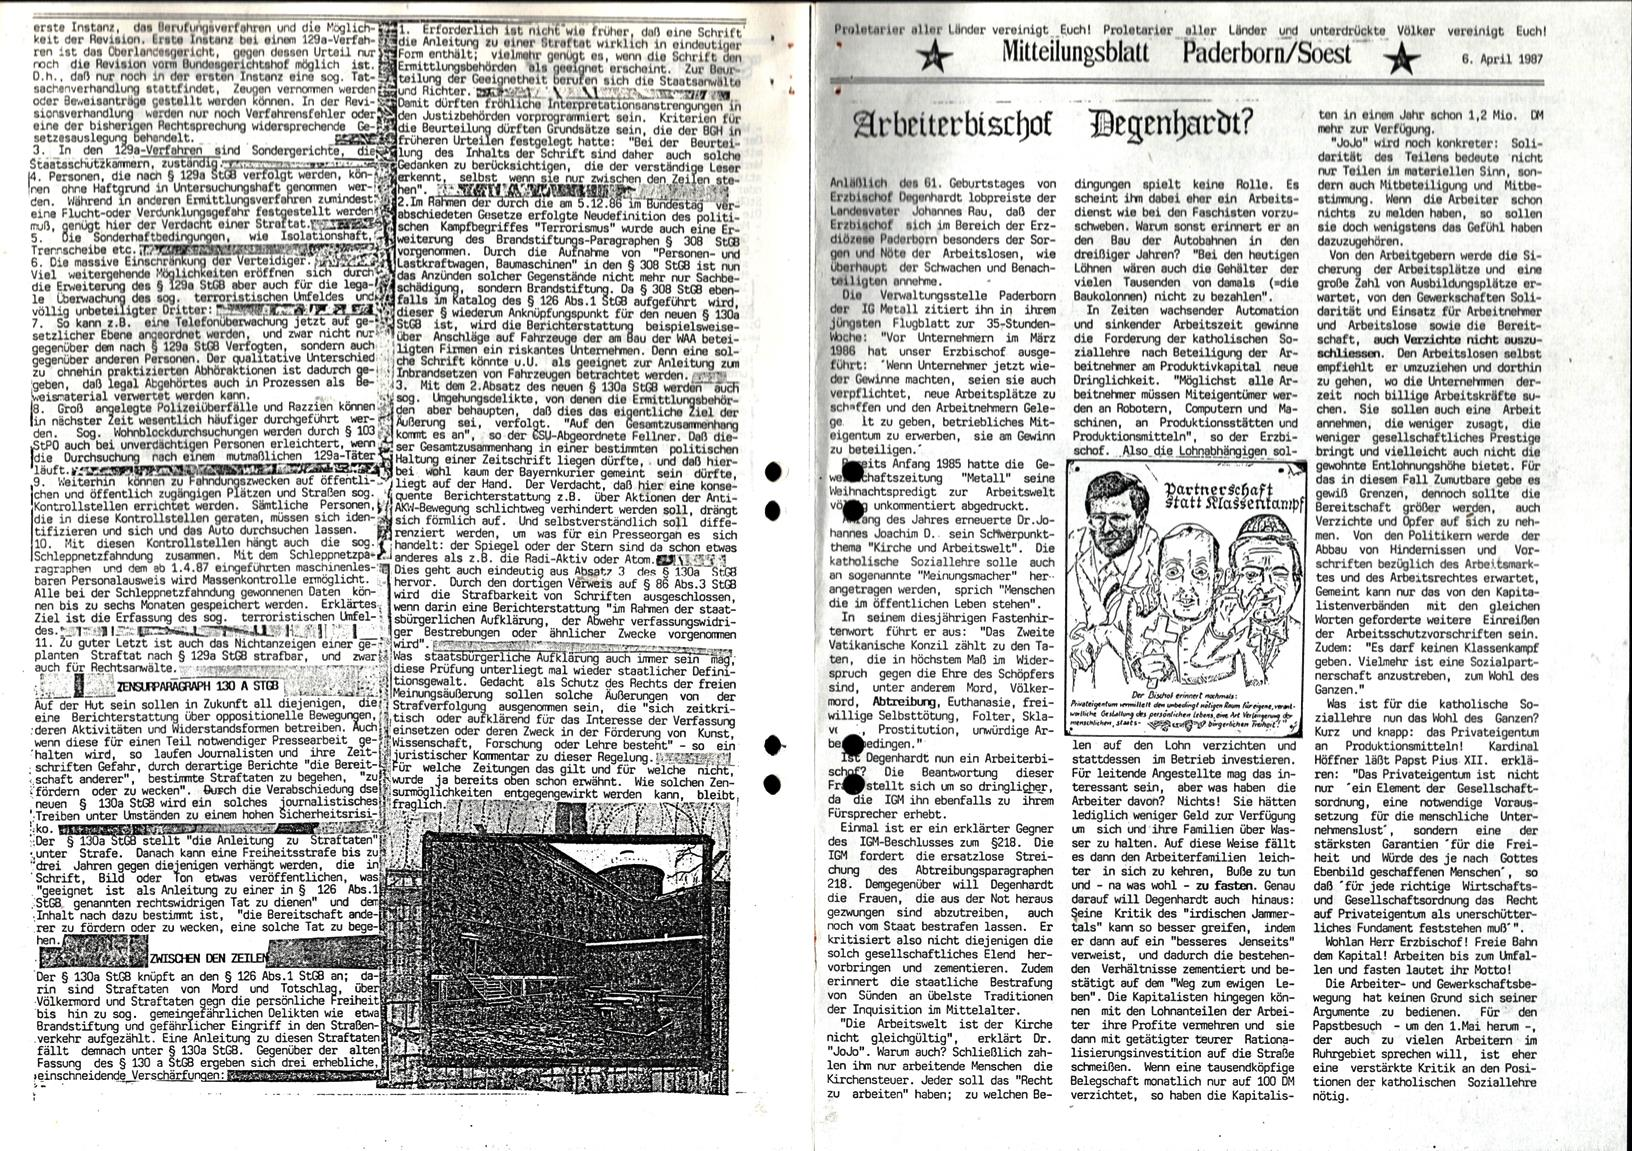 Paderborn_BWK_Mitteilungsblatt_19870406_001